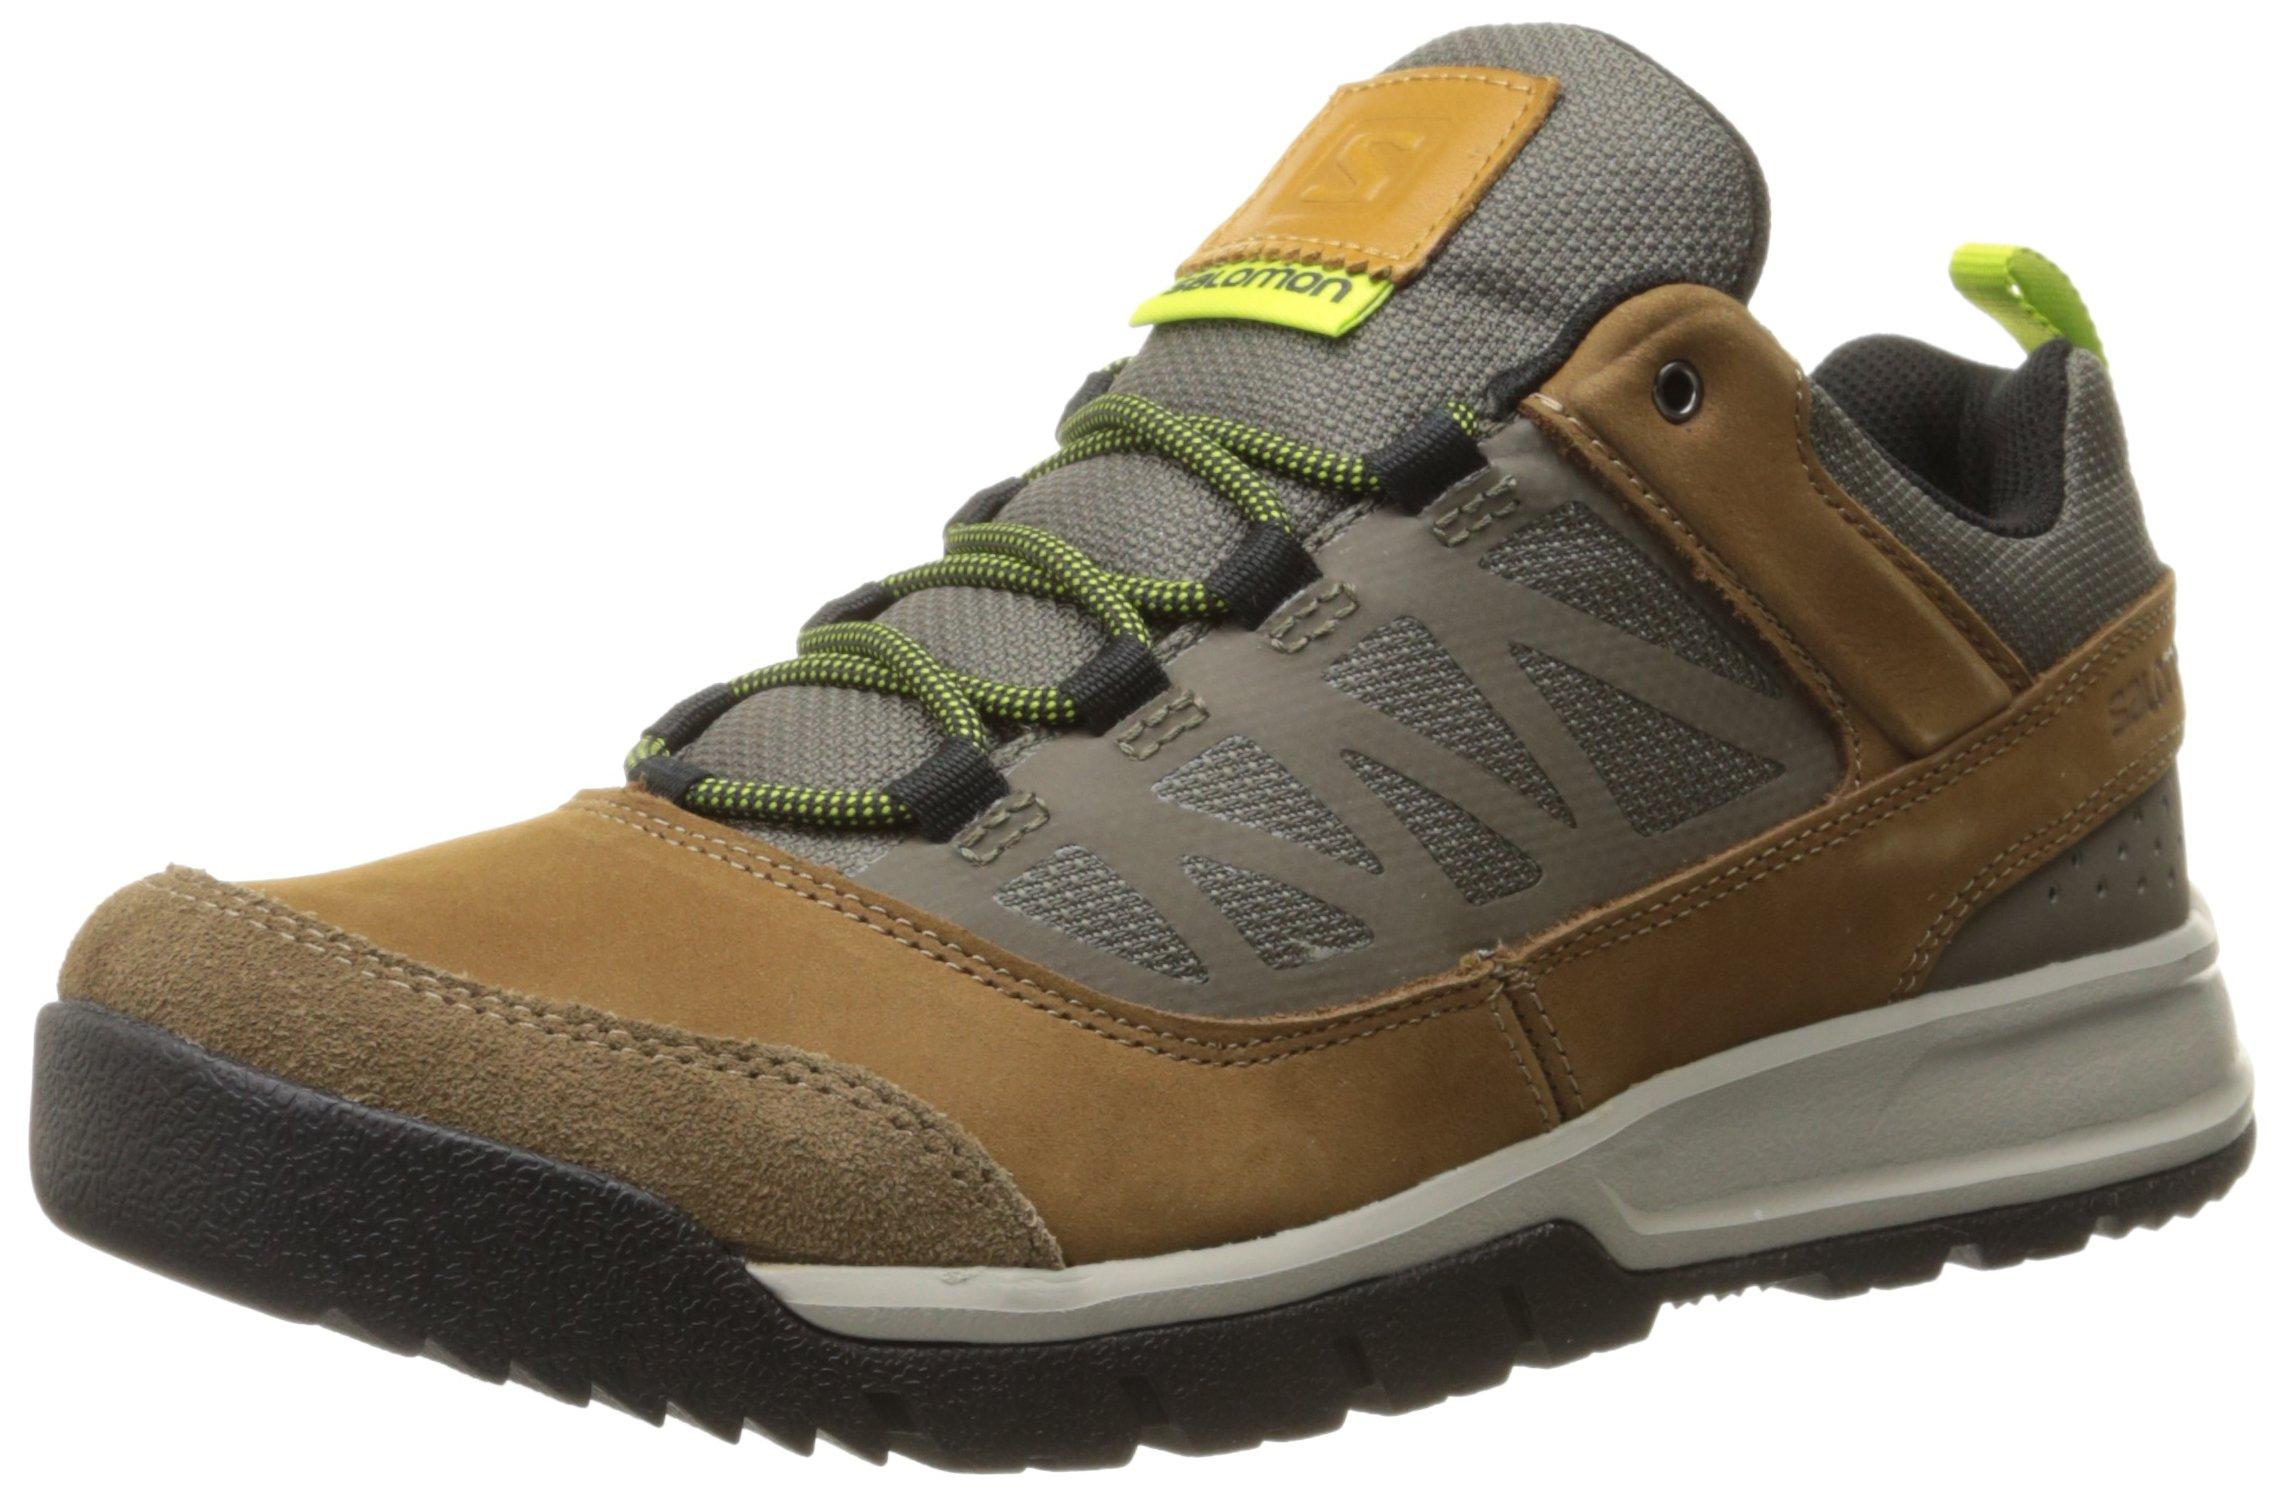 Salomon Men's Instinct Travel Outdoor Lifestyle Shoe, Camel LTR/Swamp/Green Glow, 11 D US